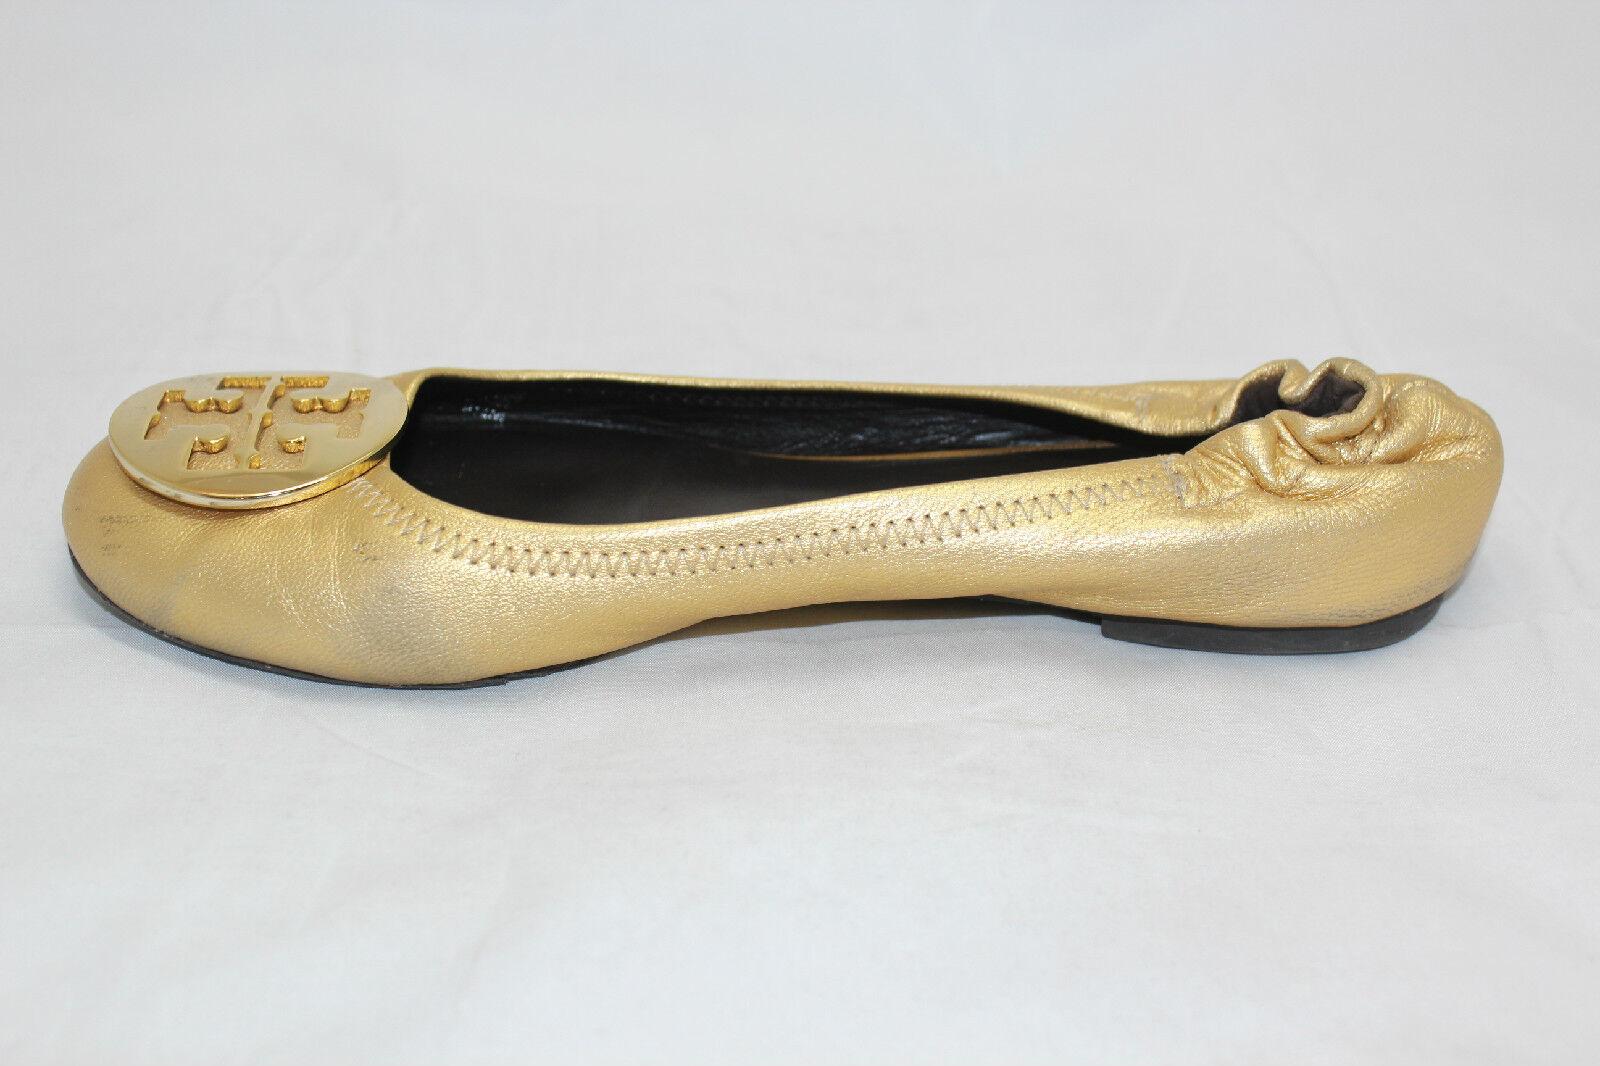 TORY BURCH Reva Metallic Gold Tumbled 8.5 Ballerina Ballet Flats 8.5 Tumbled M  (R2) 64dcc0